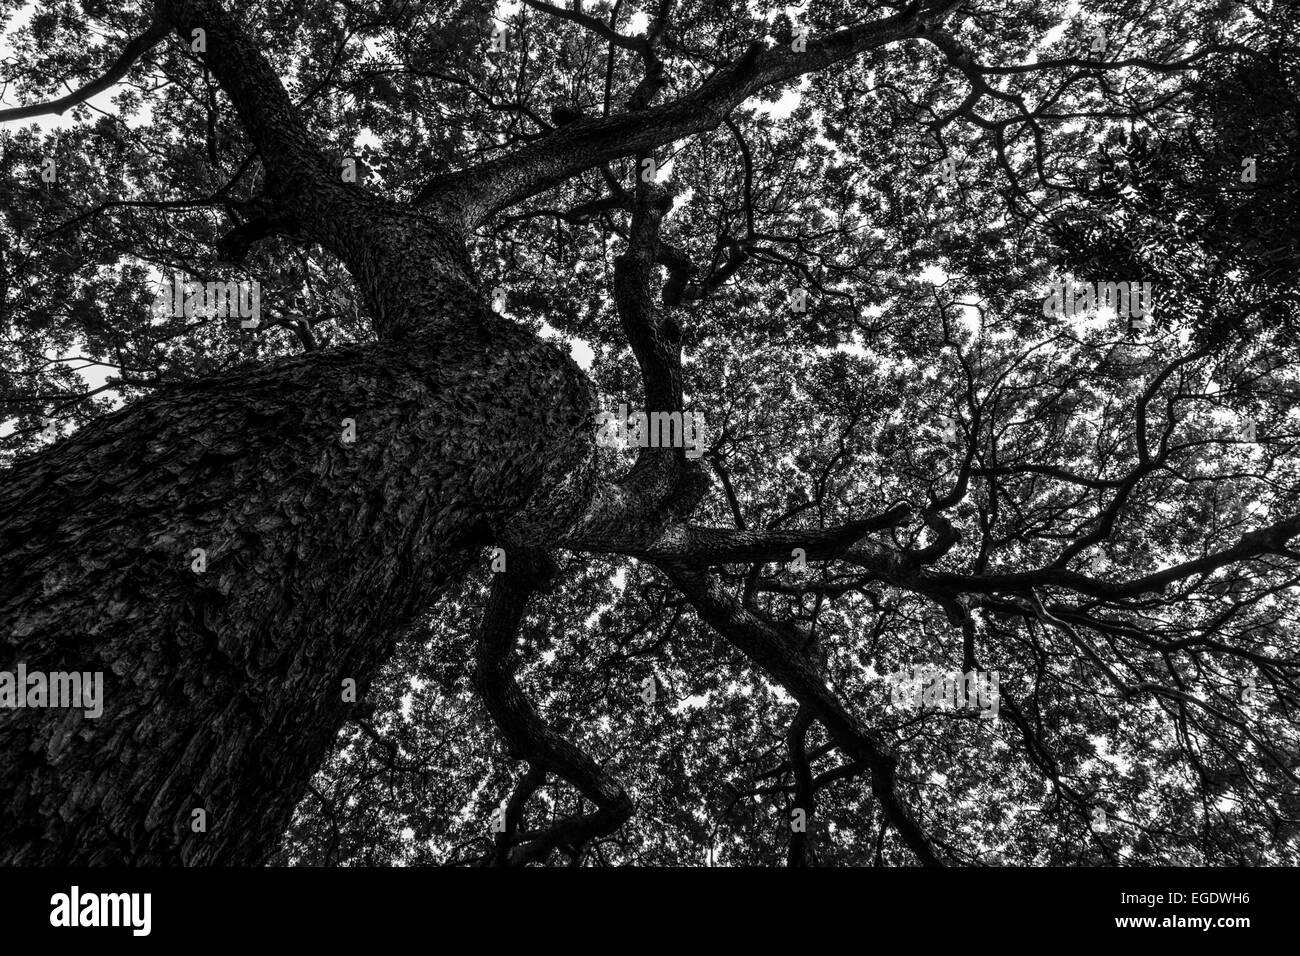 a large tree taken from below - Stock Image